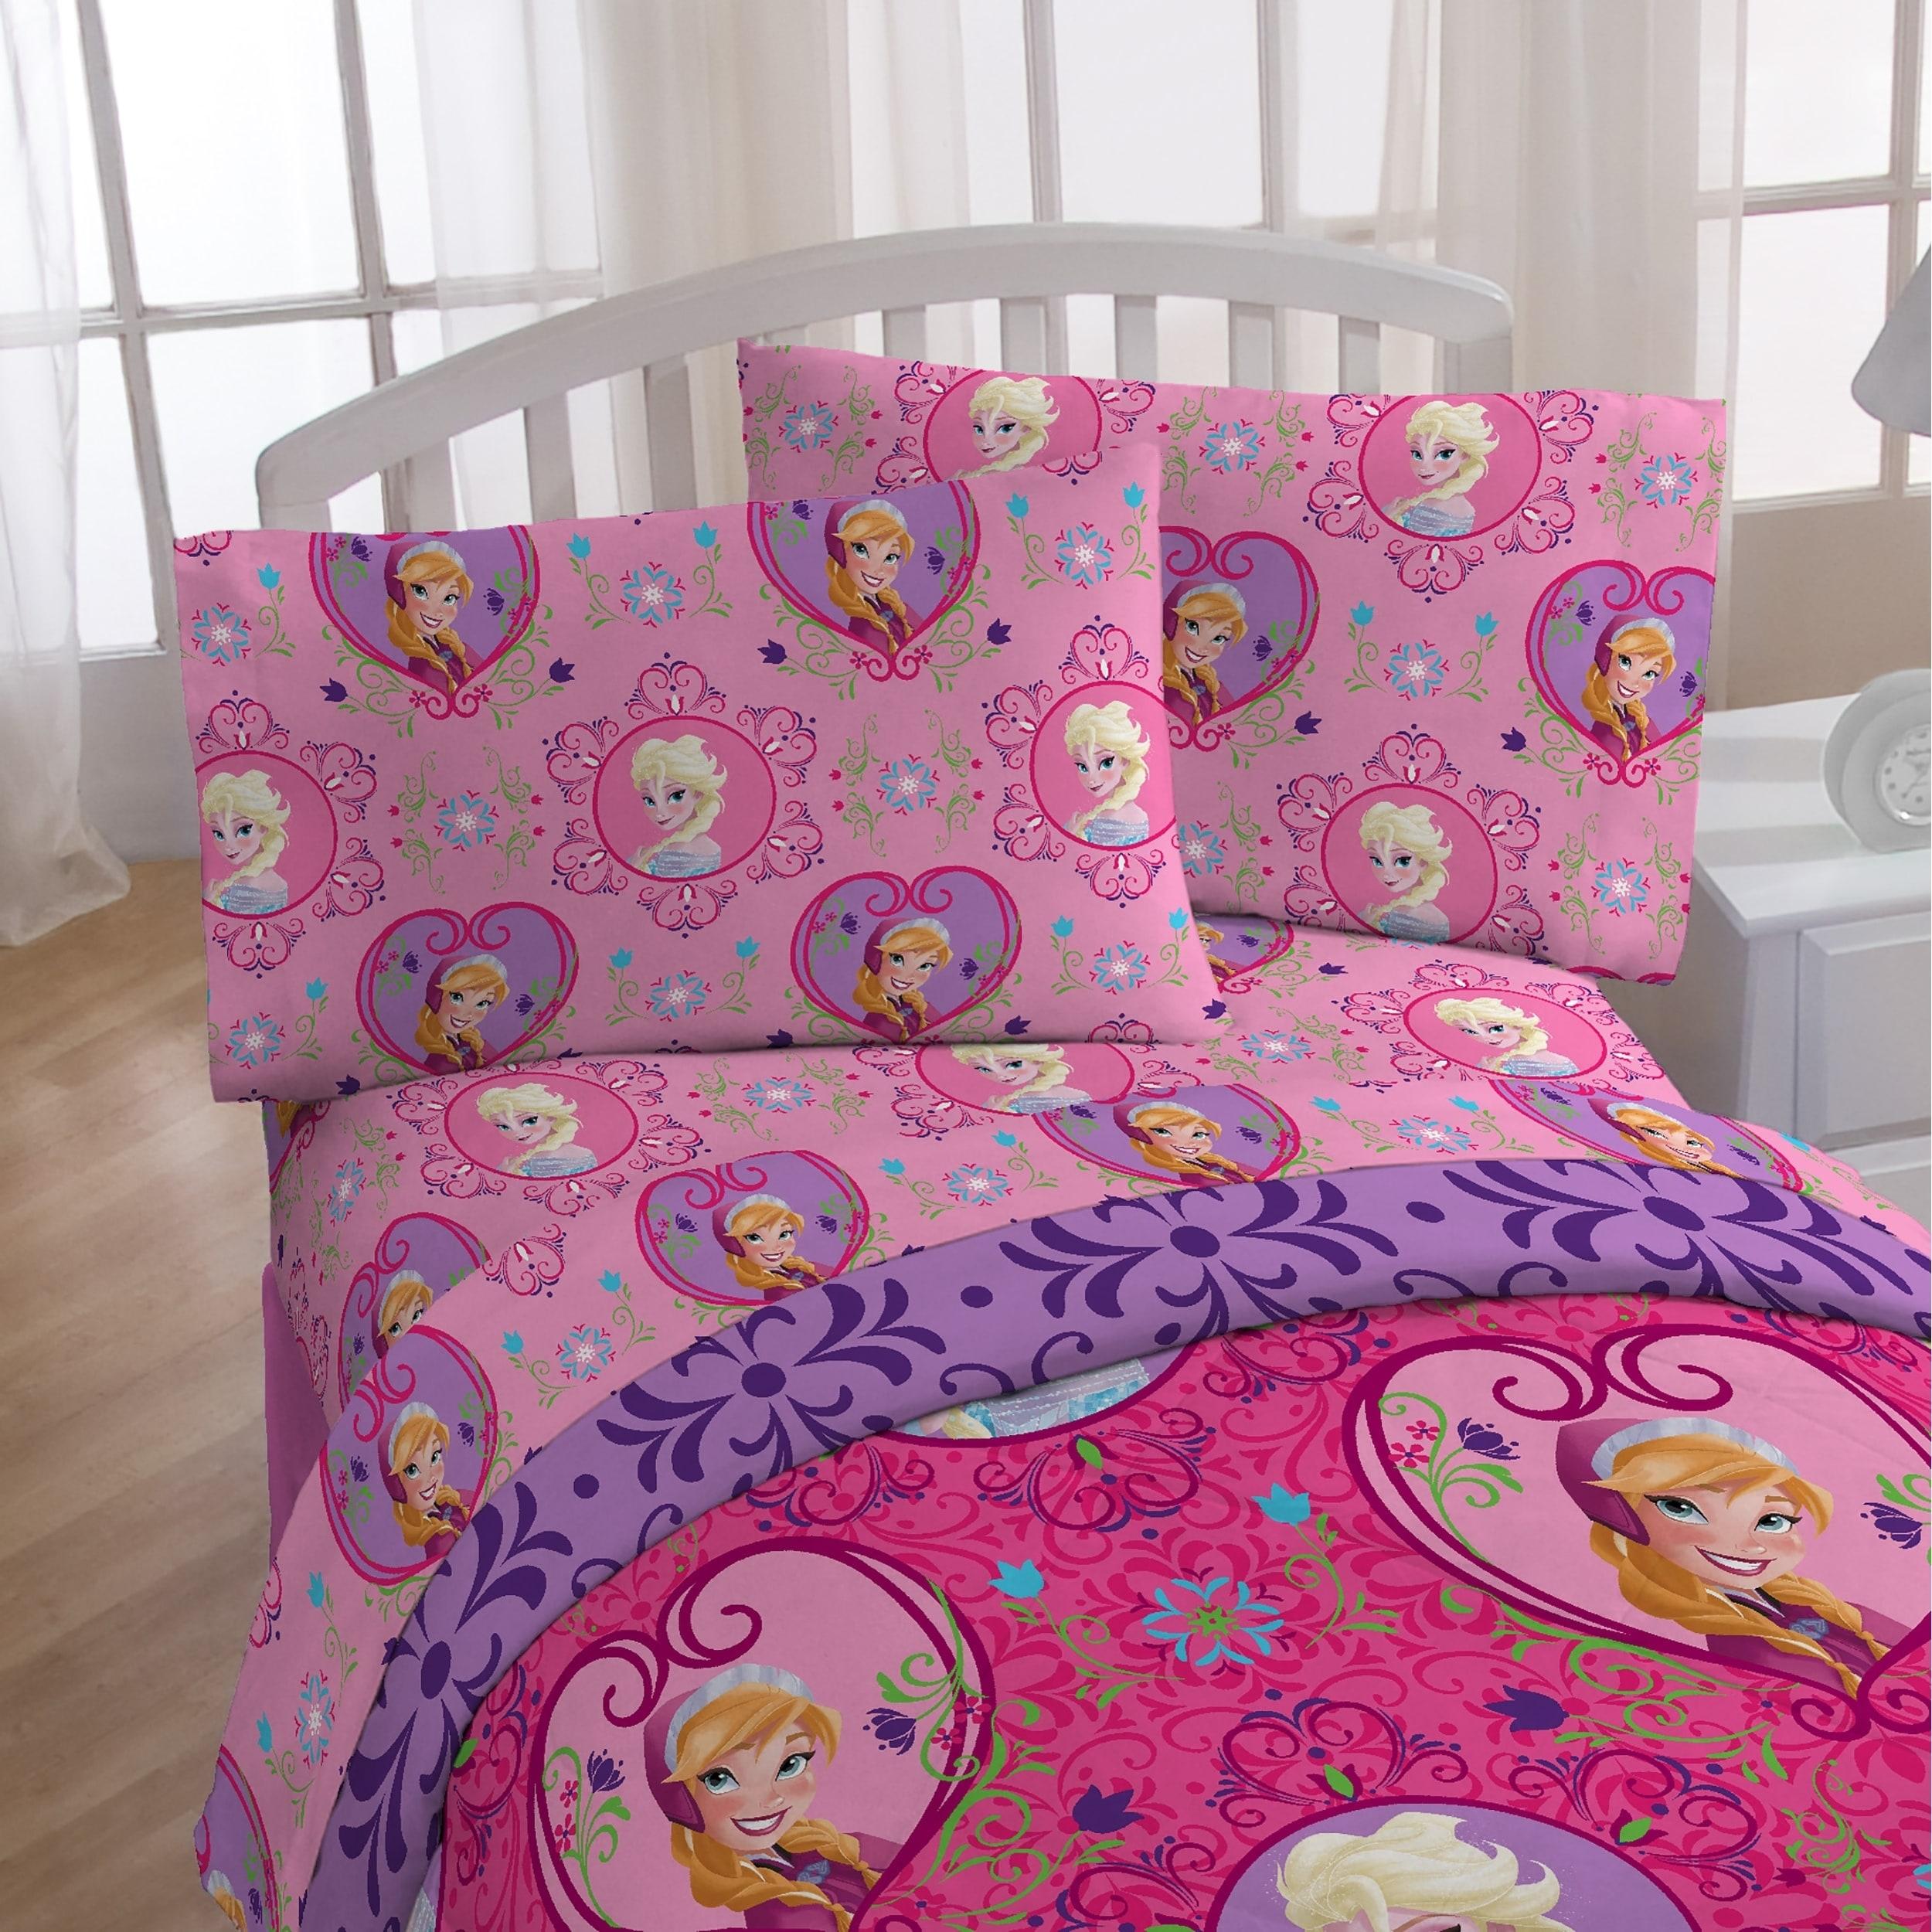 Shop Disney Frozen Friendship 4 Piece Twin Bed In A Bag On Sale